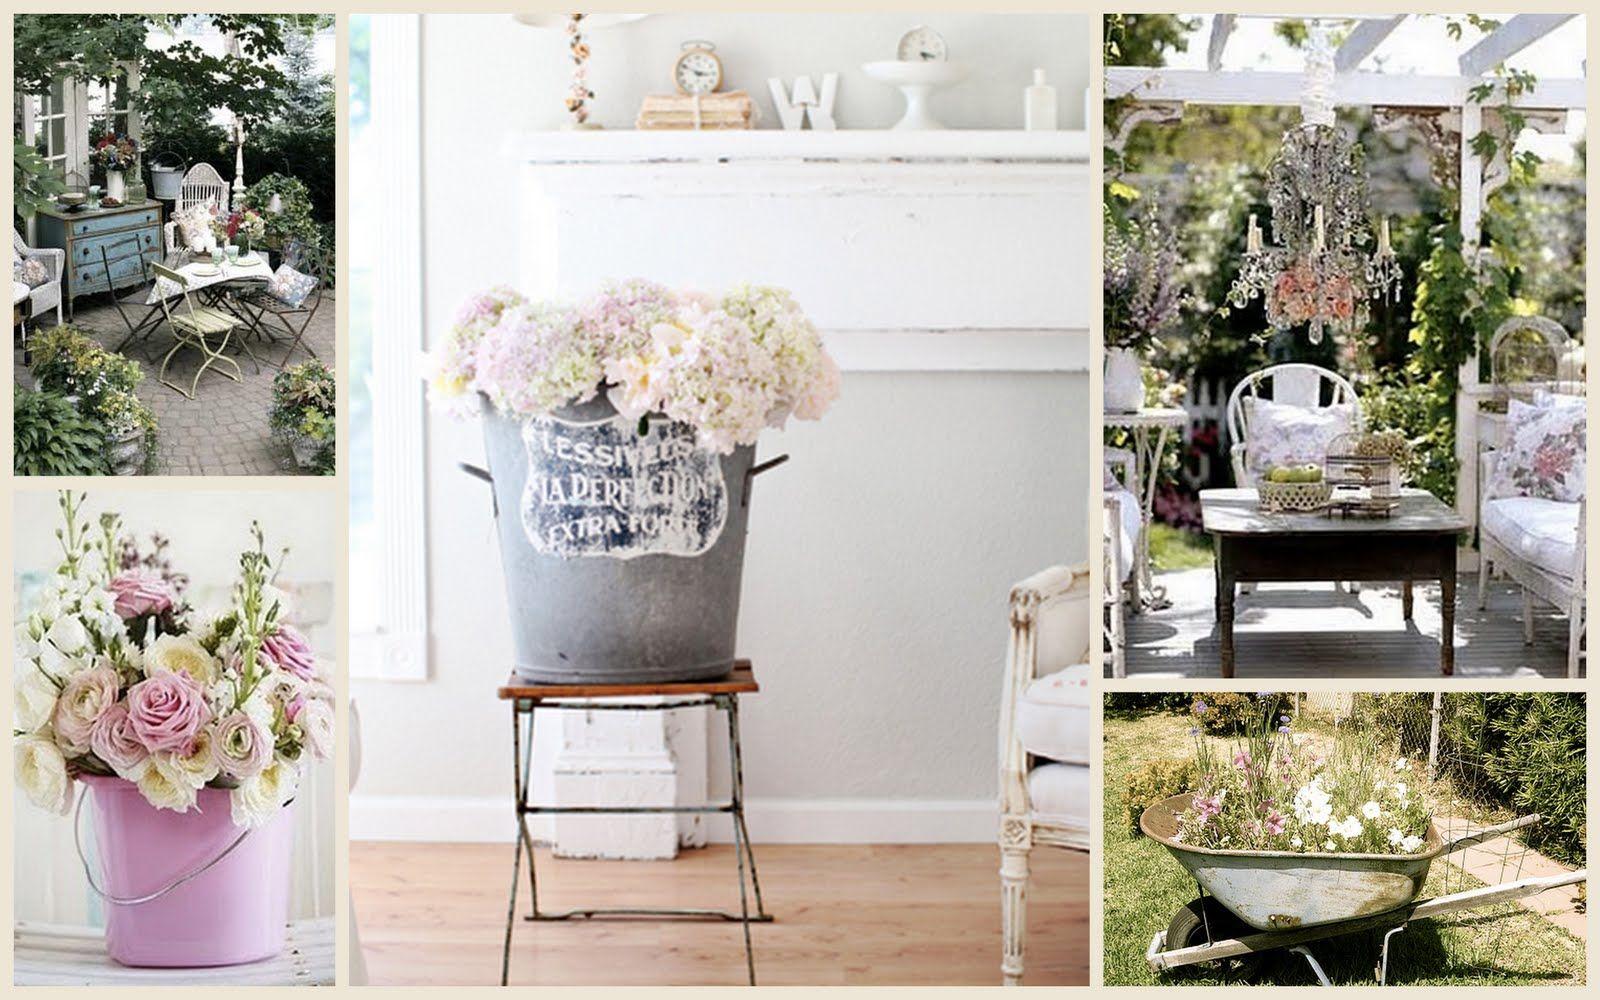 Garden Wedding Inspiration - Weddings of Desire Blog